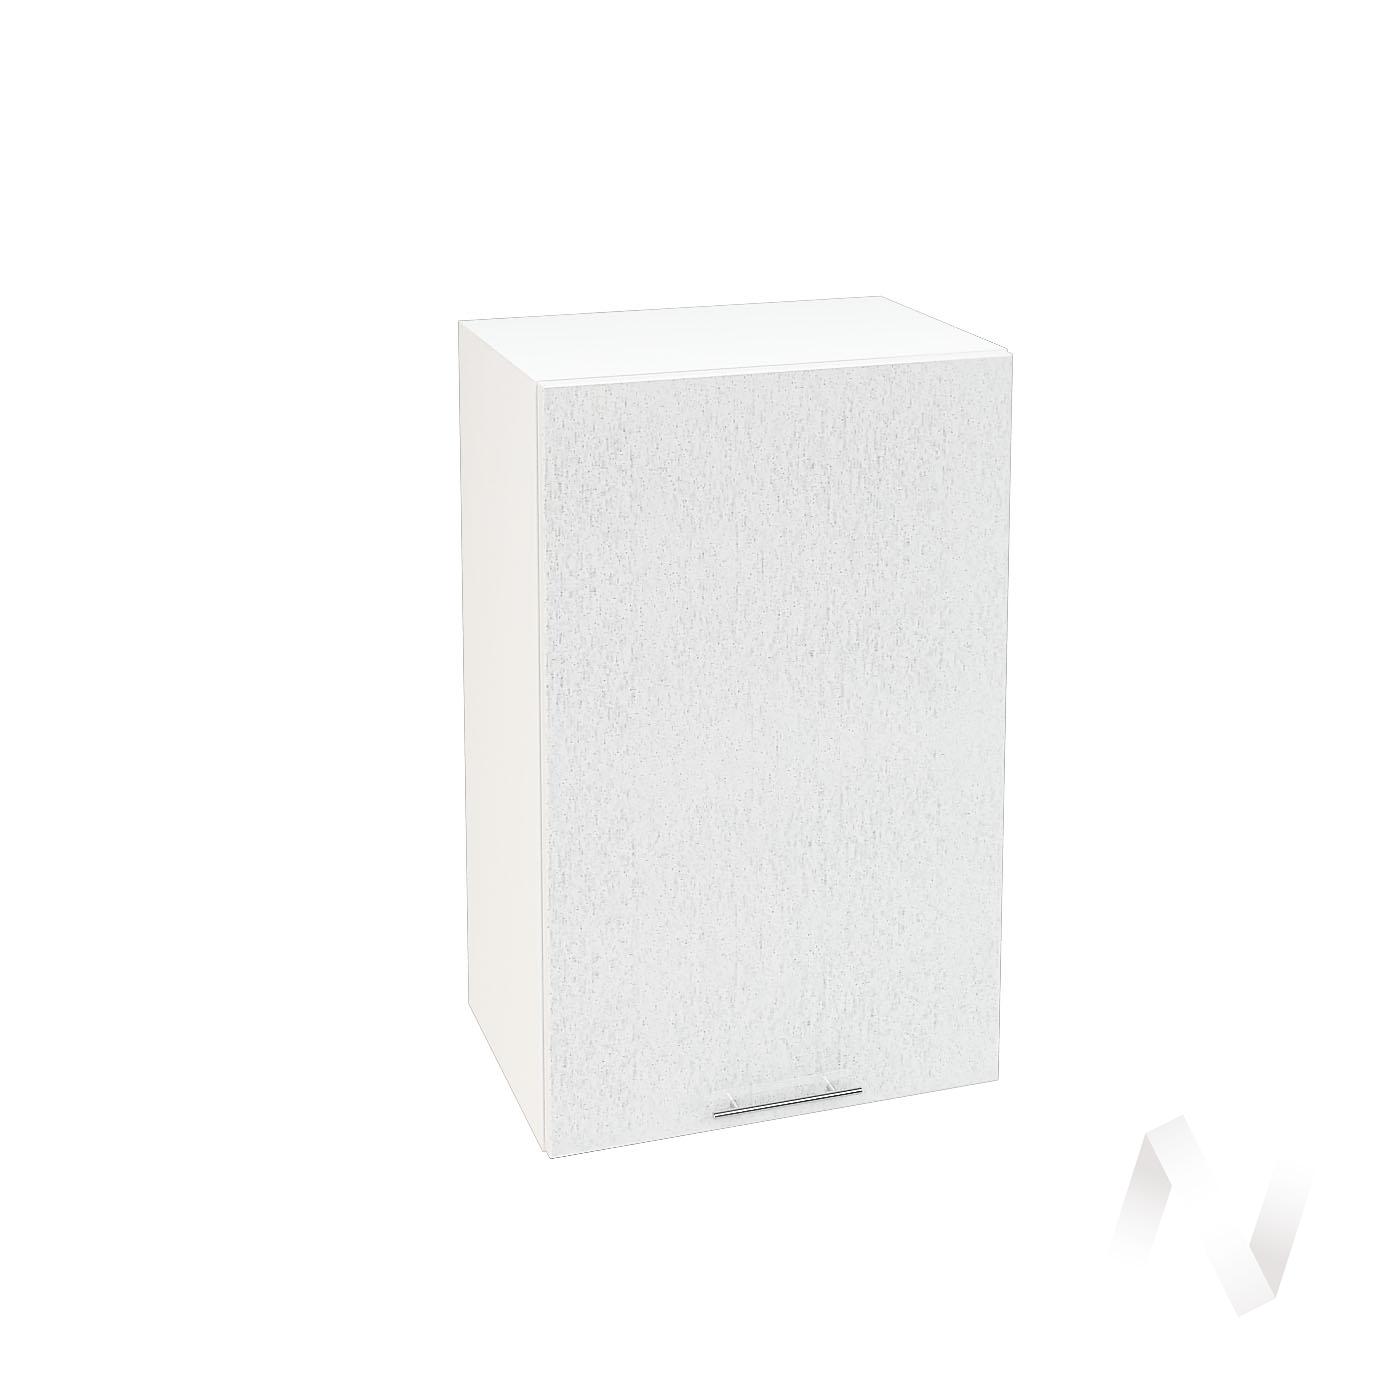 "Кухня ""Валерия-М"": Шкаф верхний 450, ШВ 450 (дождь серый/корпус белый)"